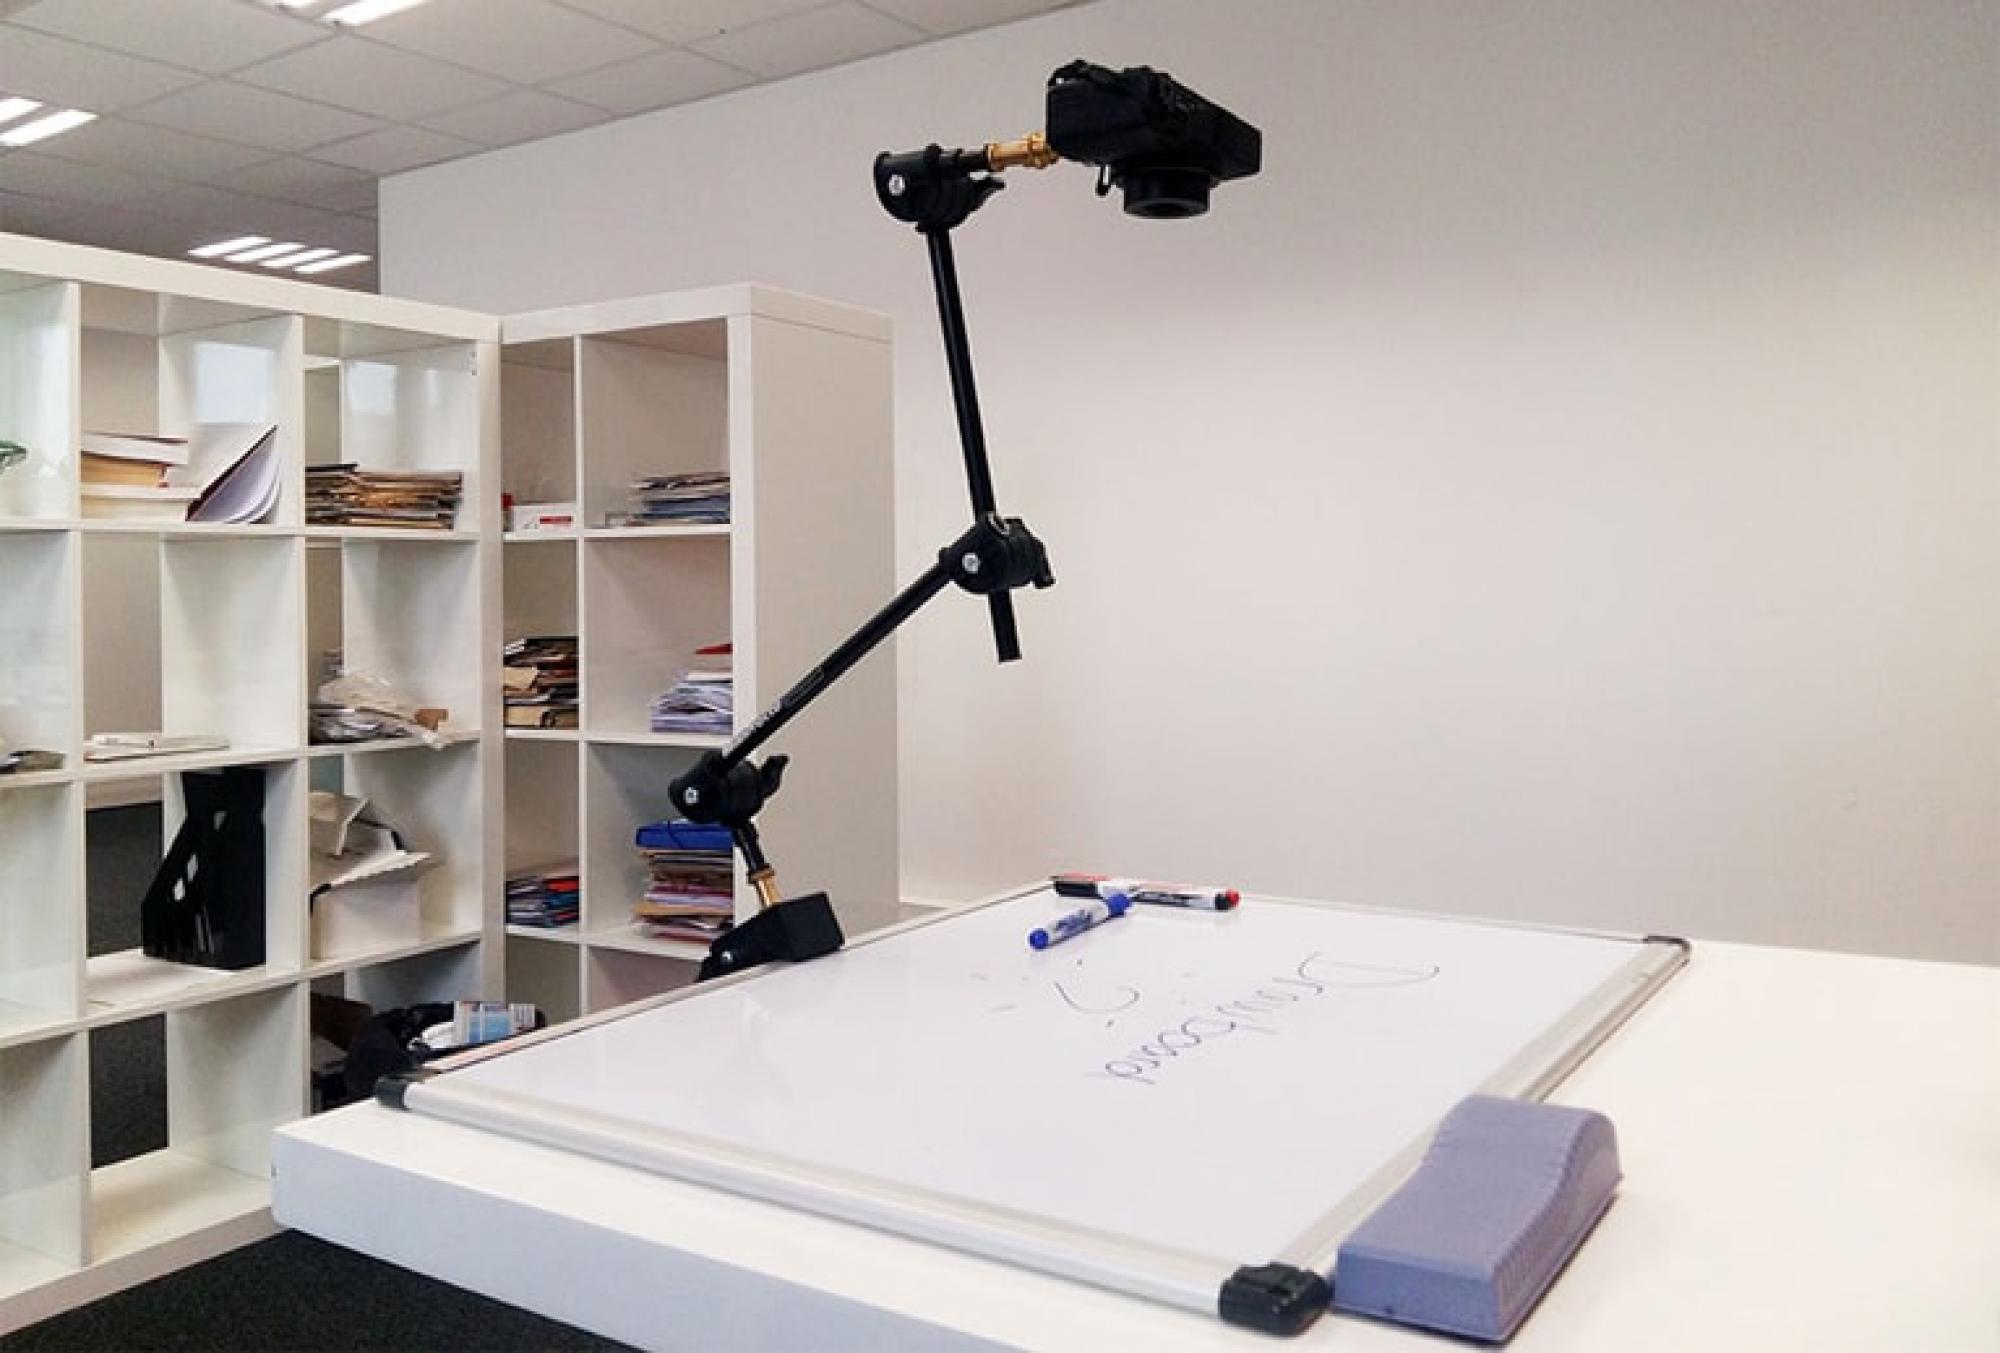 photo drawboard : comment comprendre Drupal